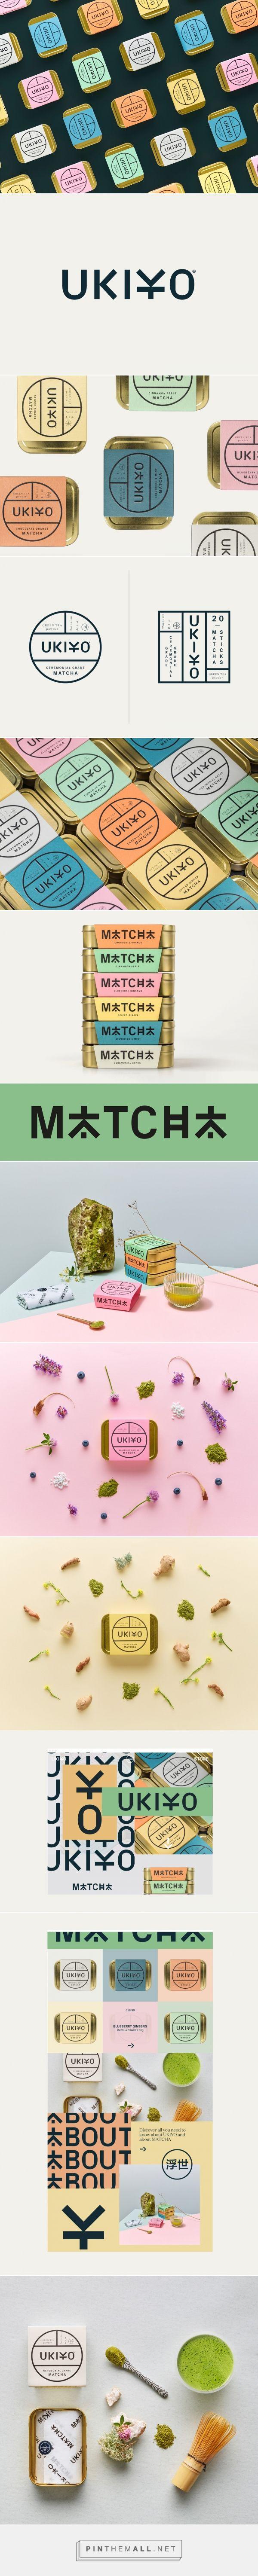 UKIYO matcha tea packaging design by IWANT design - https://www.packagingoftheworld.com/2018/04/ukiyo.html